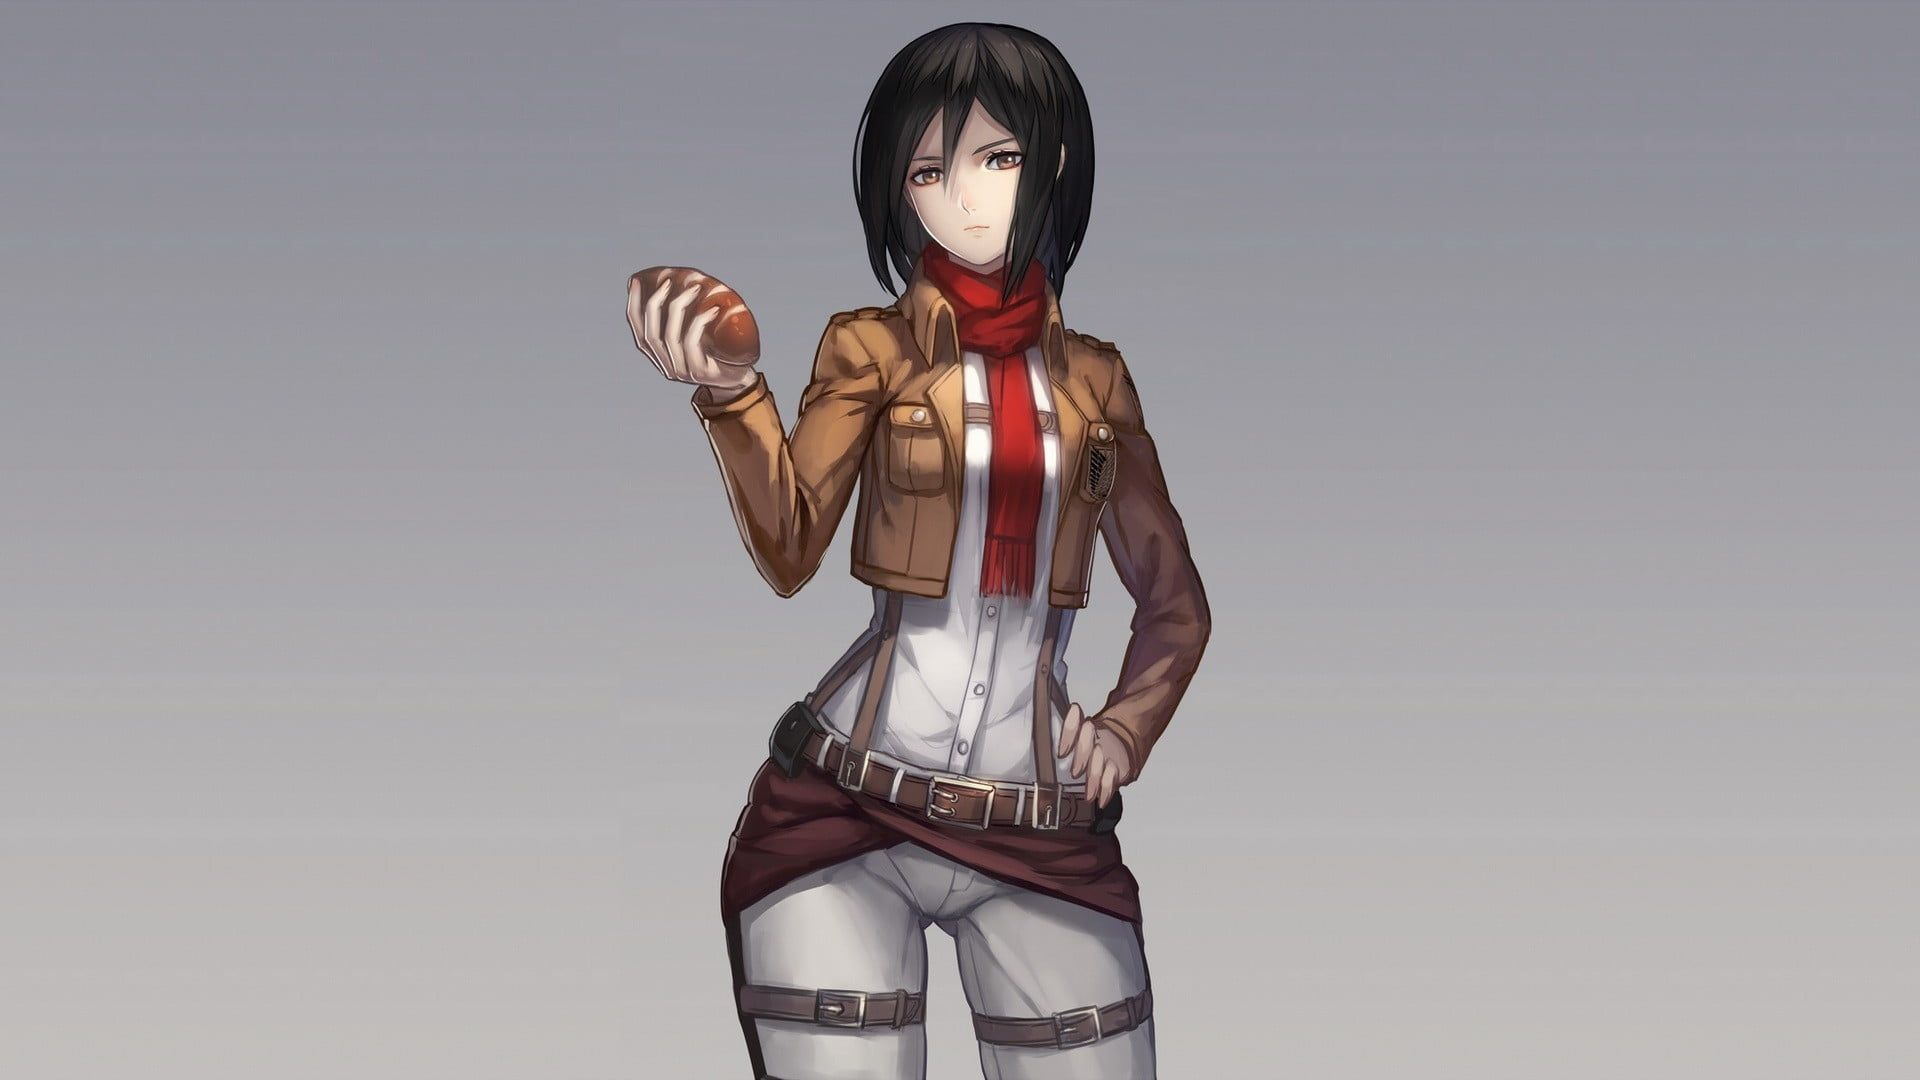 Black Haired Female Anime Character Shingeki No Kyojin Mikasa Ackerman 1080p Wallpaper Hdwallpaper Desktop Female Anime Attack On Titan Anime